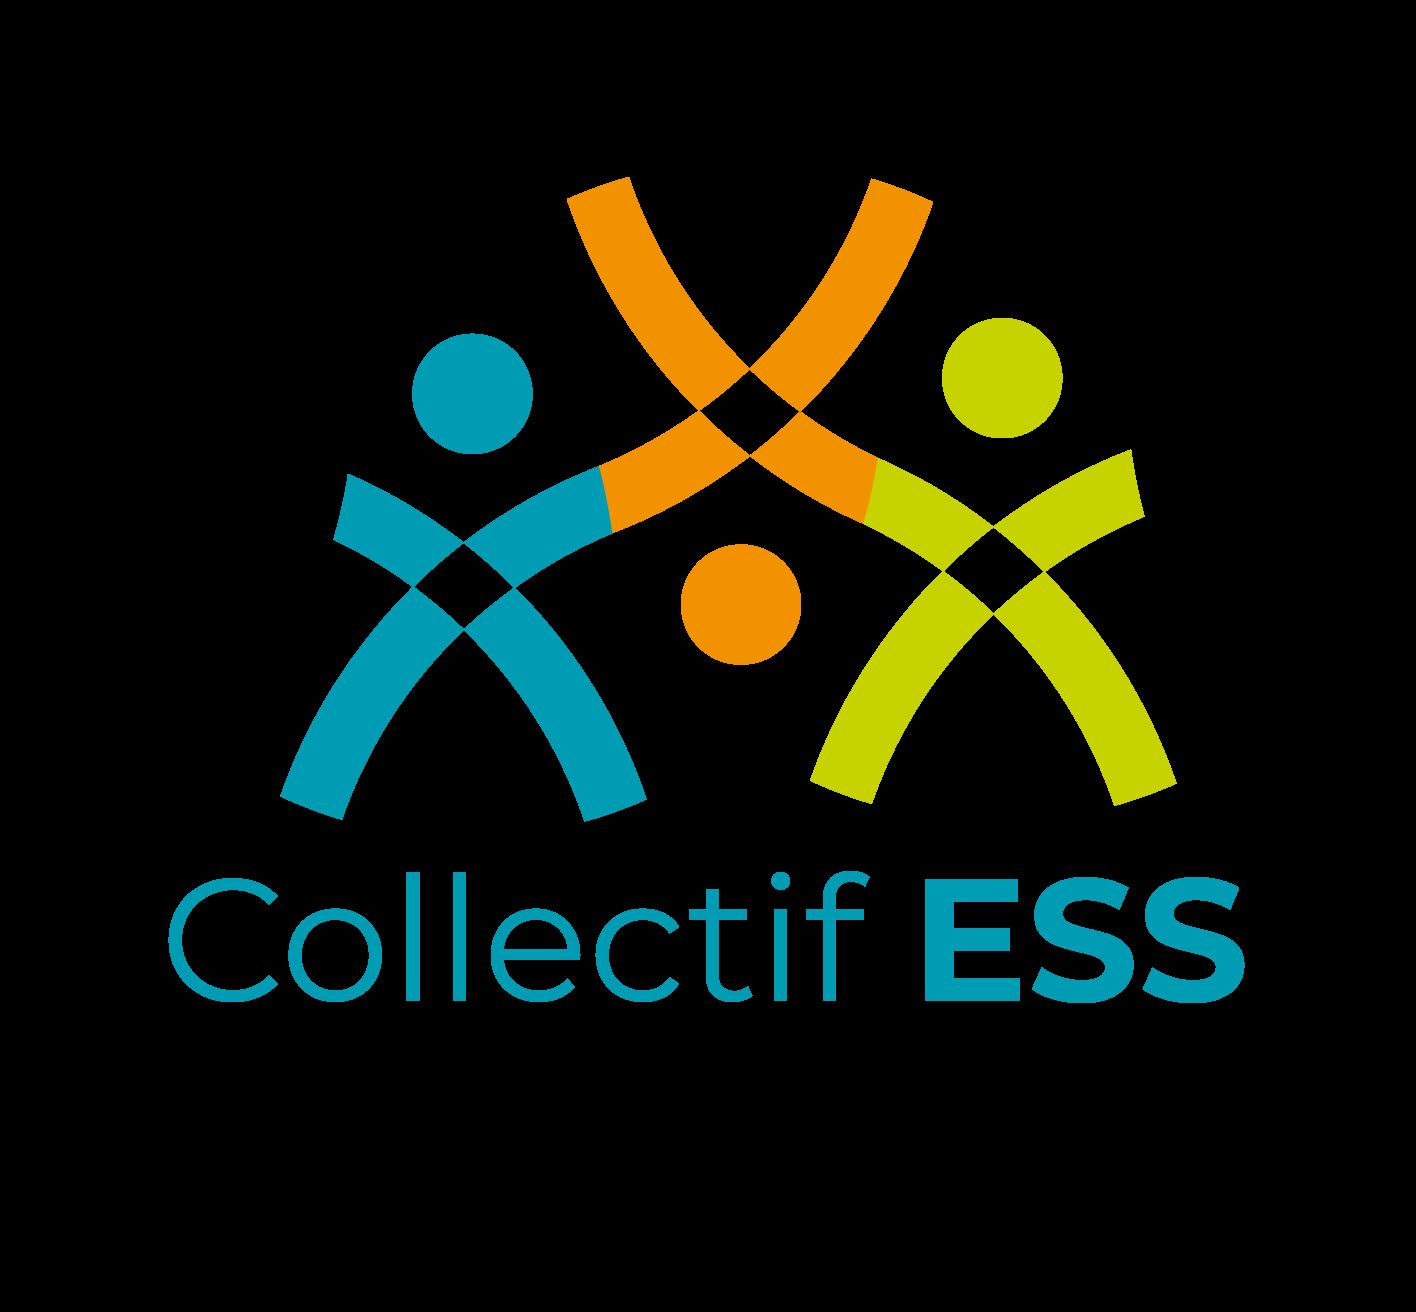 assets/images/custom/collectifEssArrageois/default_directory.png